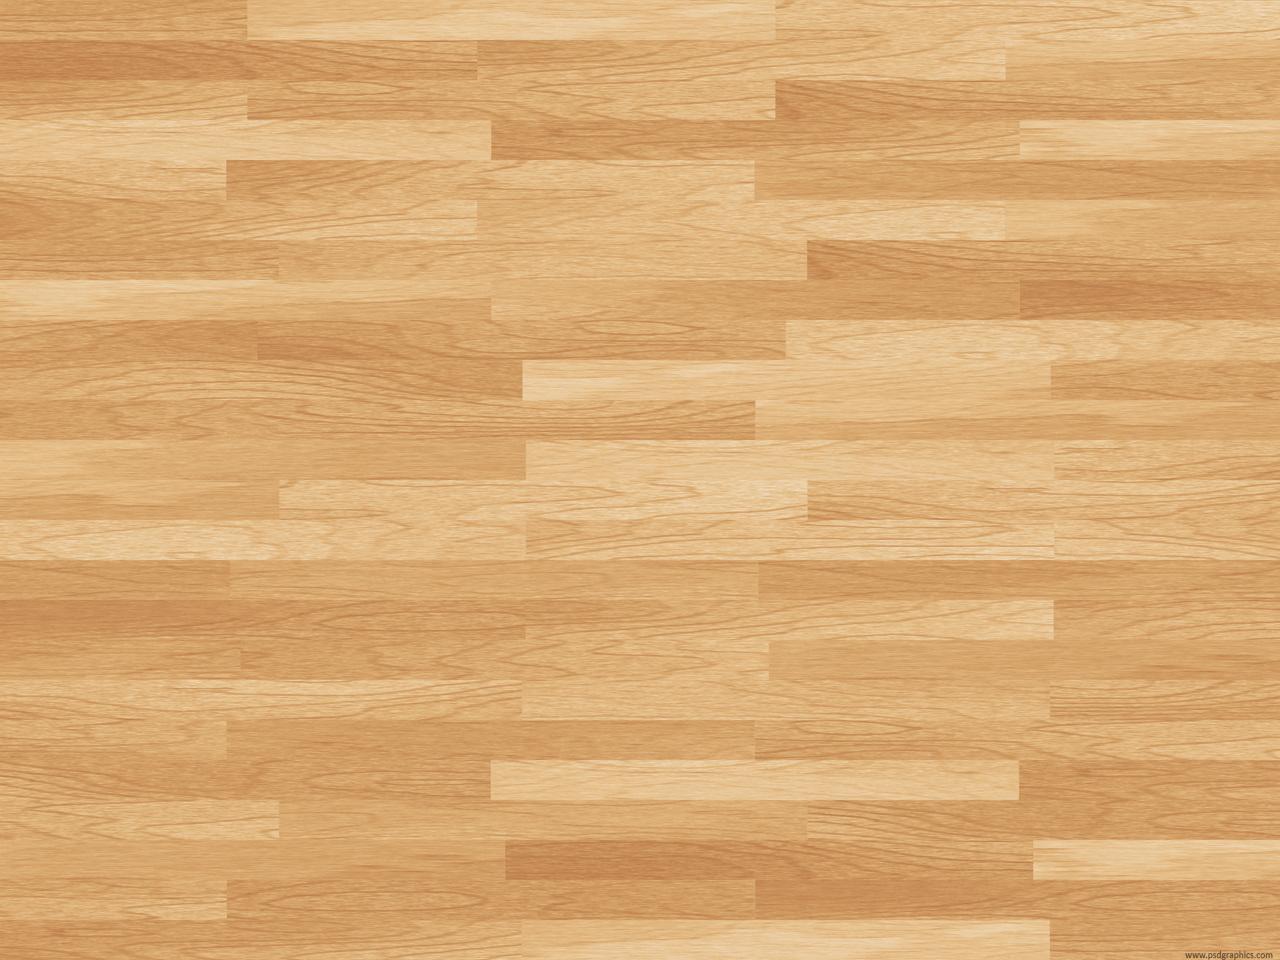 Clip Art Carpet And Flooring : Hardwood floor clip art cliparts